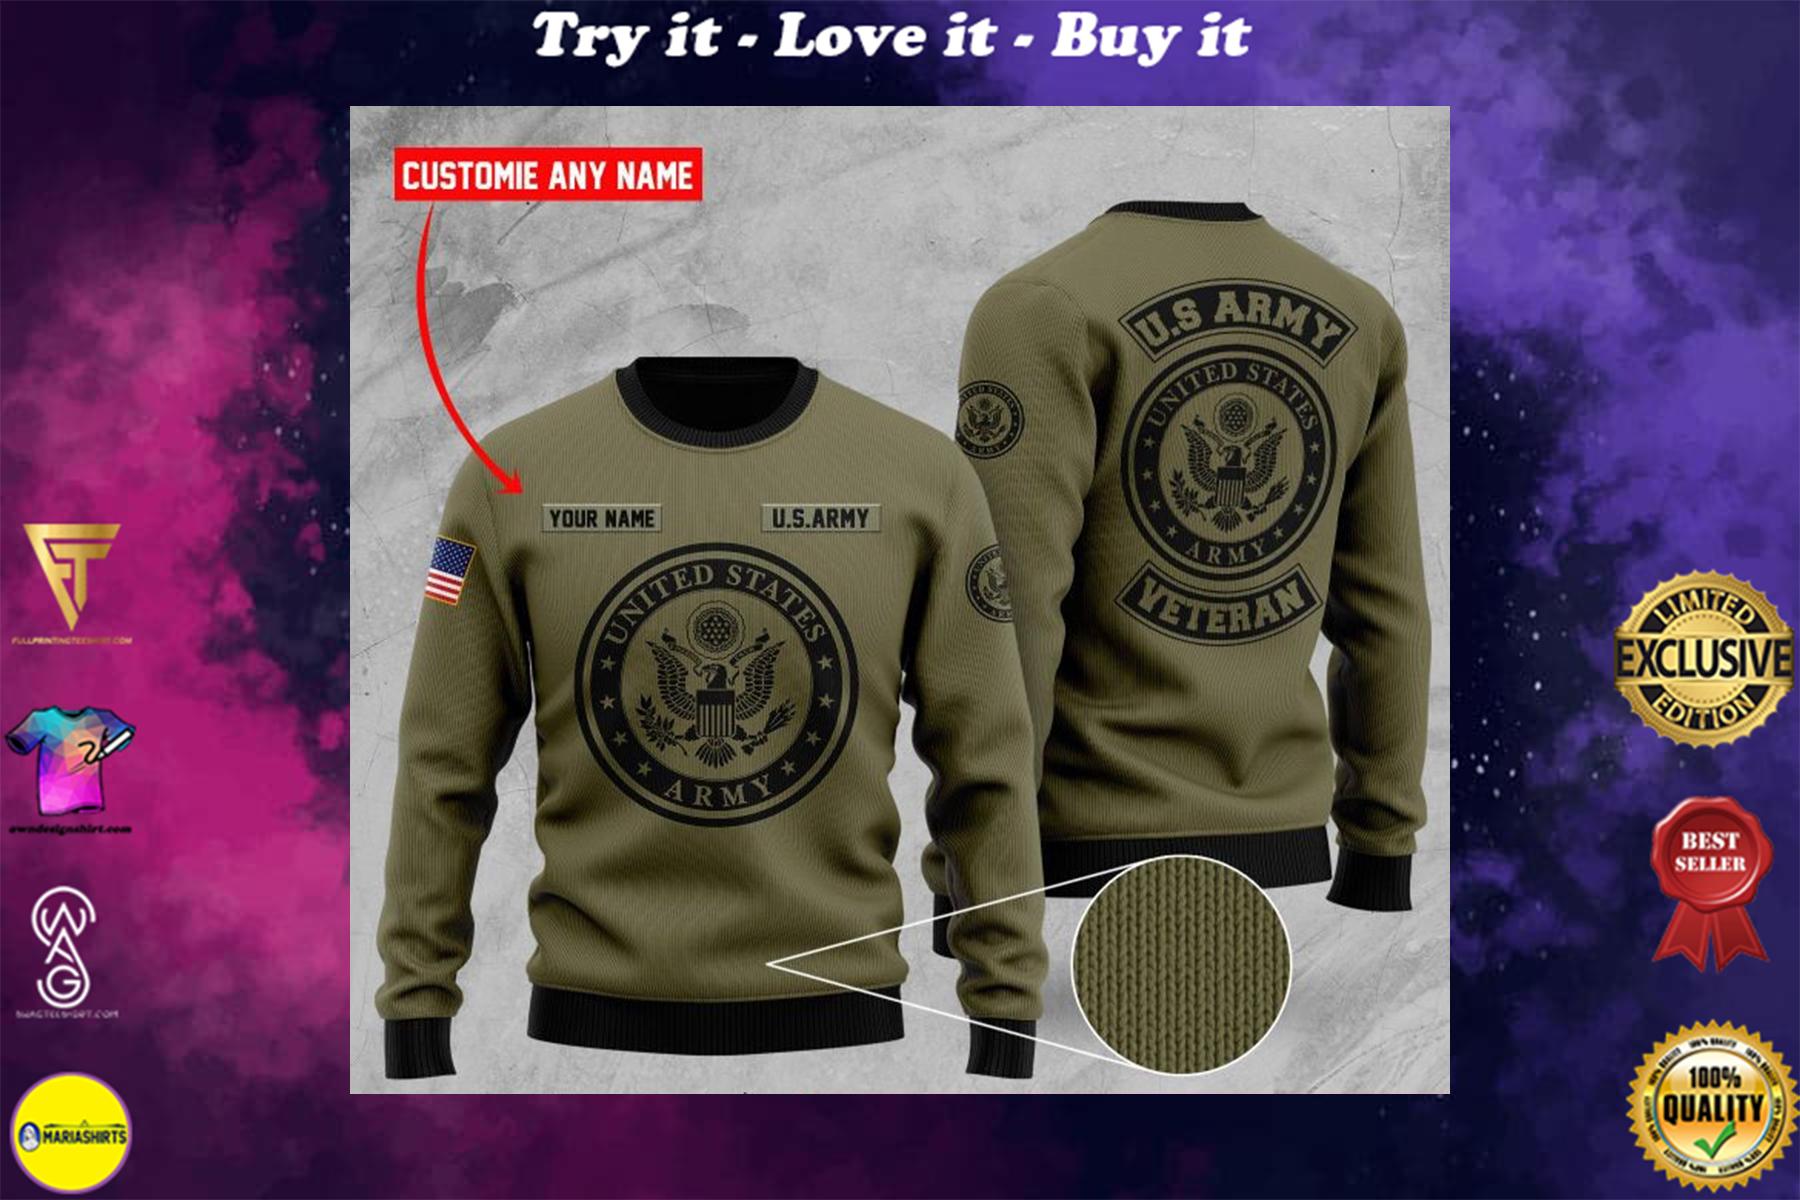 custom name united states army veteran ugly sweater